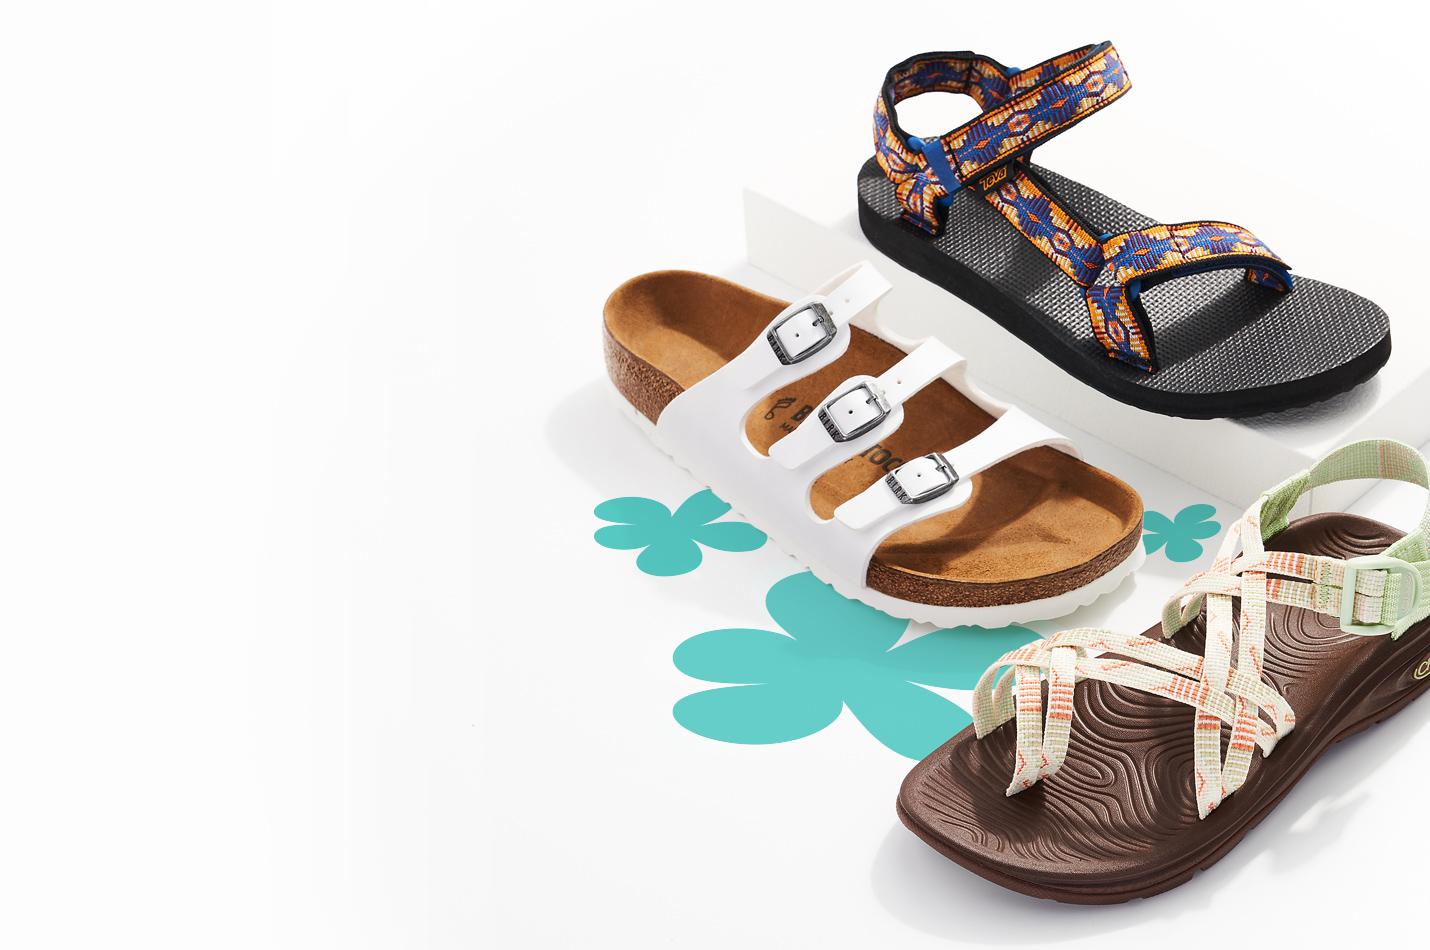 assorted teva, birkenstock, and chaco sandals